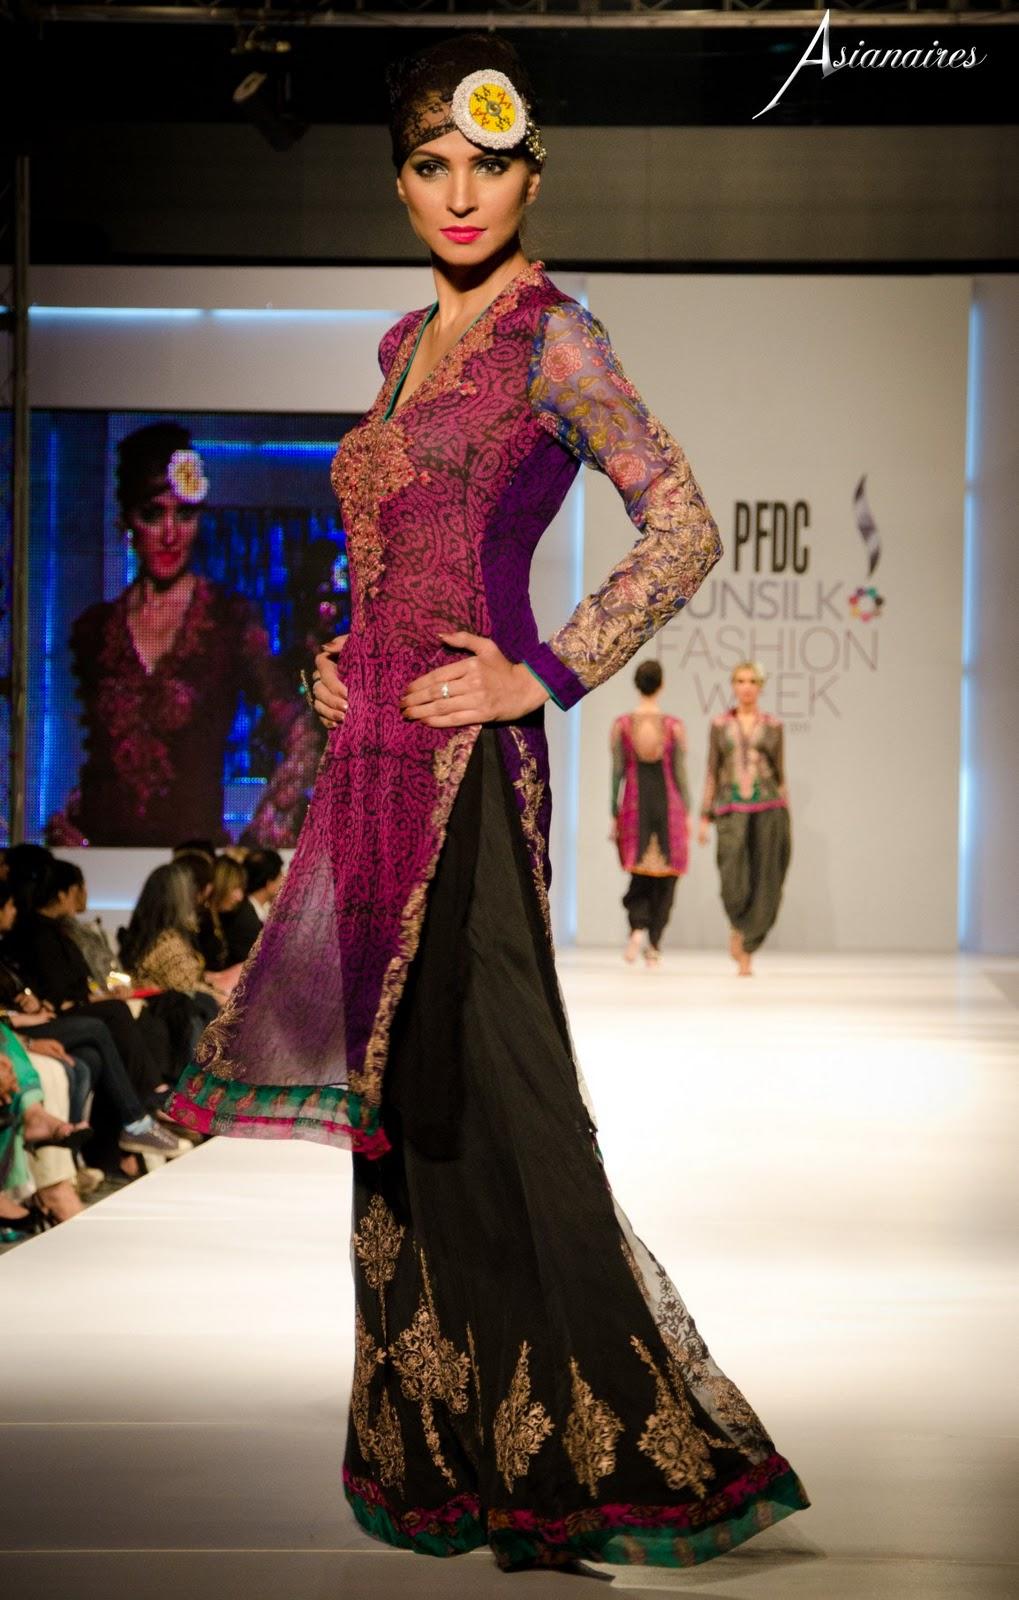 Fashion Week 2015 On Pinterest: Pakland Fashion: Nickie Nina (pfdc Fashion Week